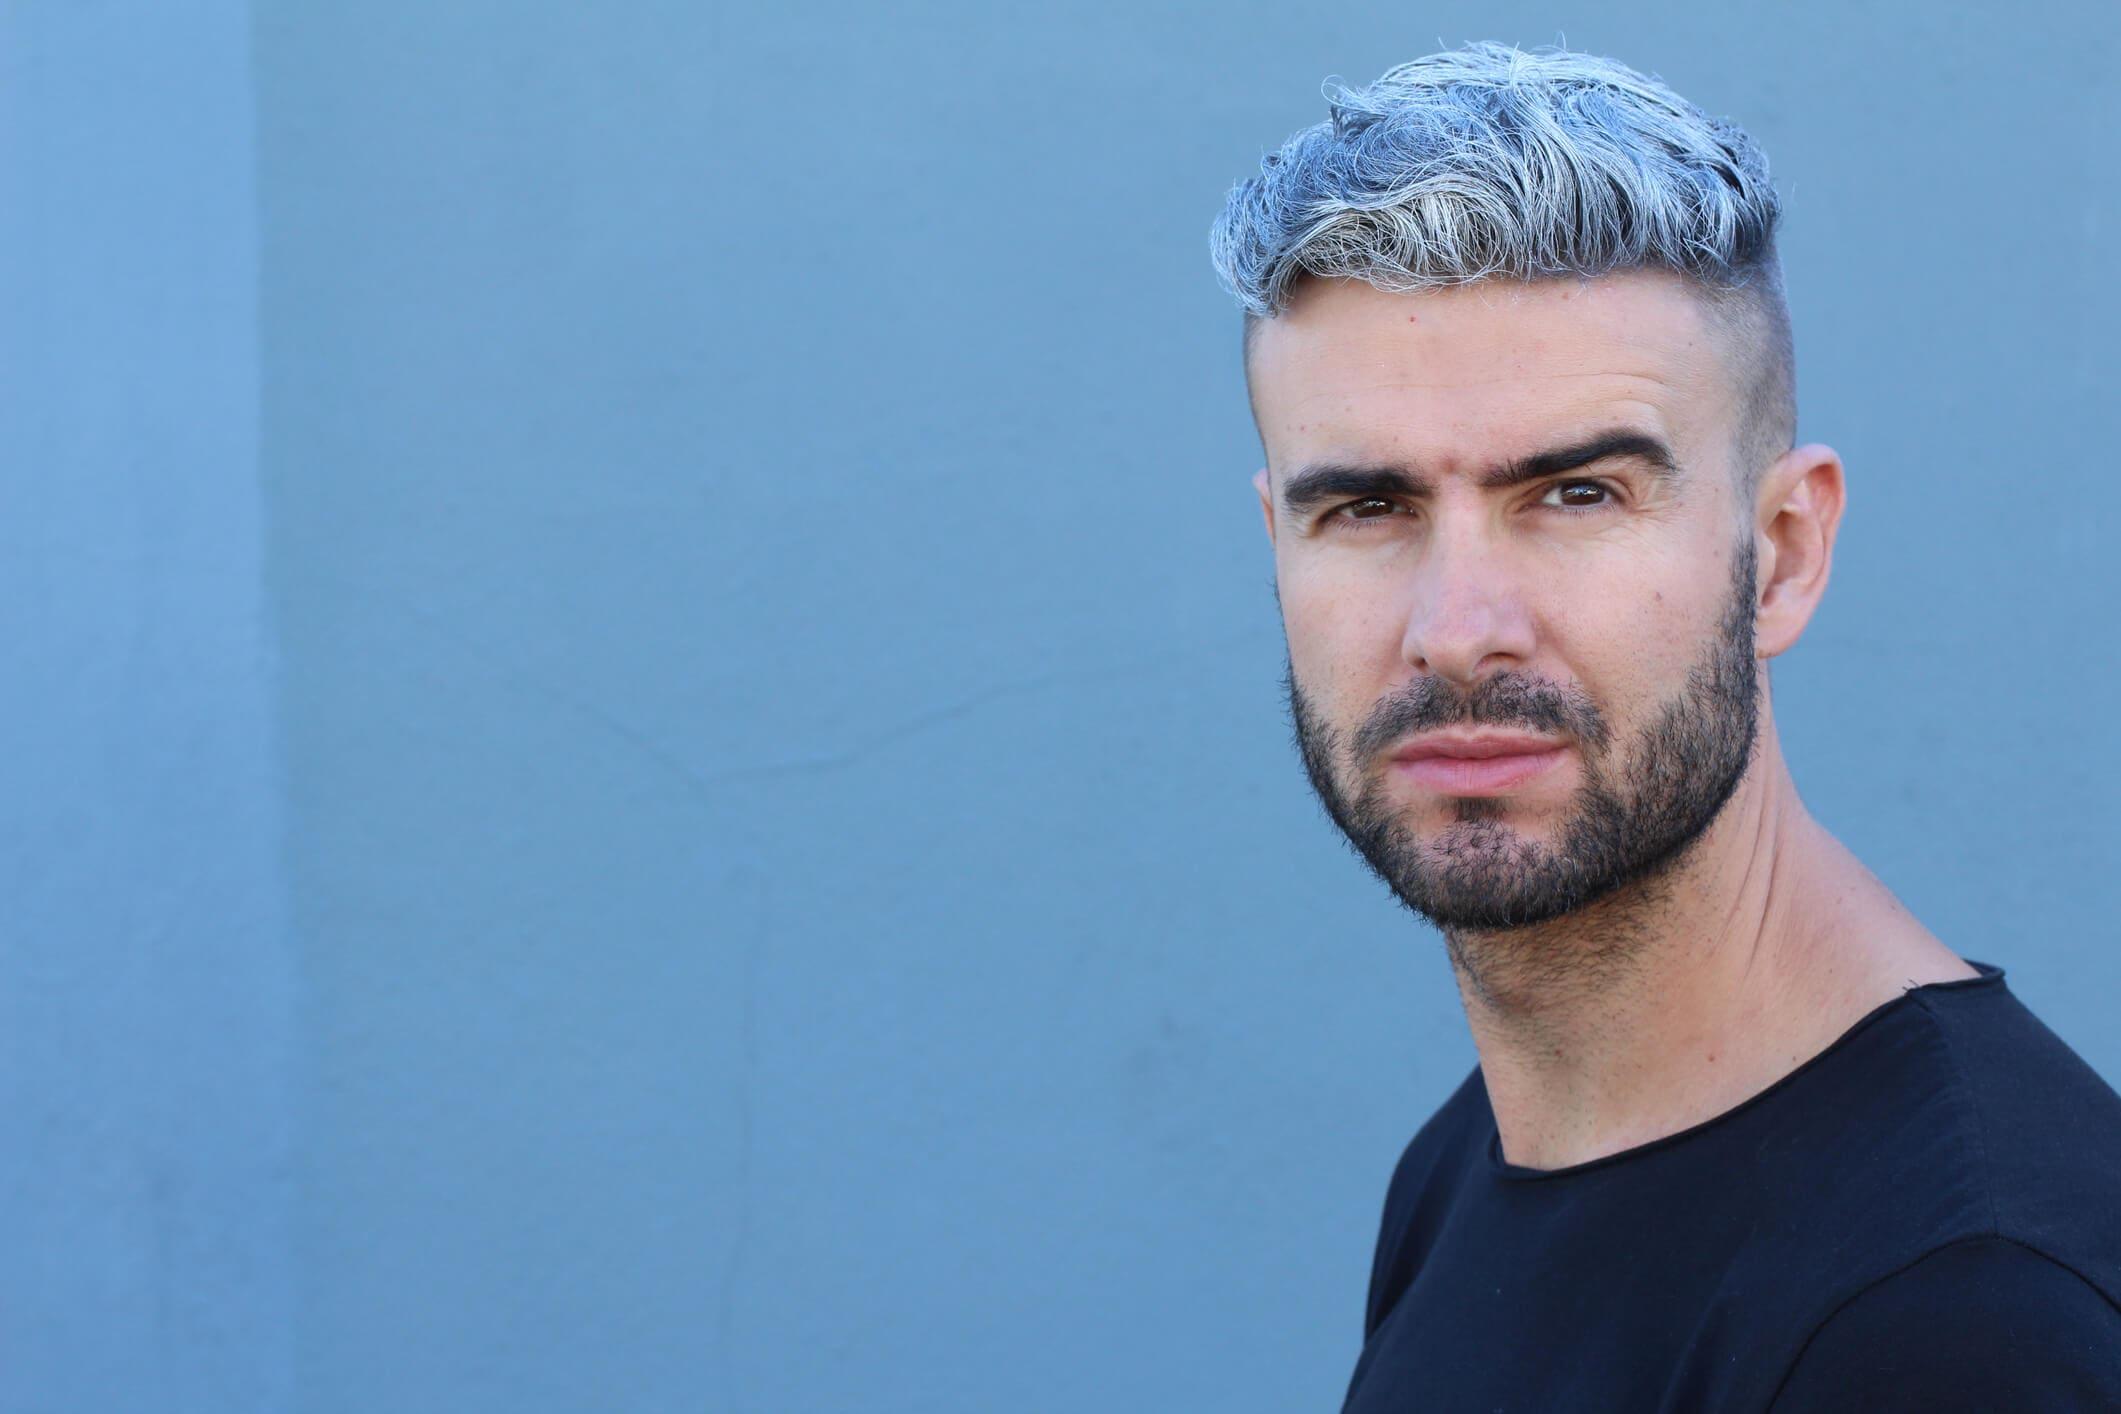 tintes de colores para el pelo corto hombre pelo azul